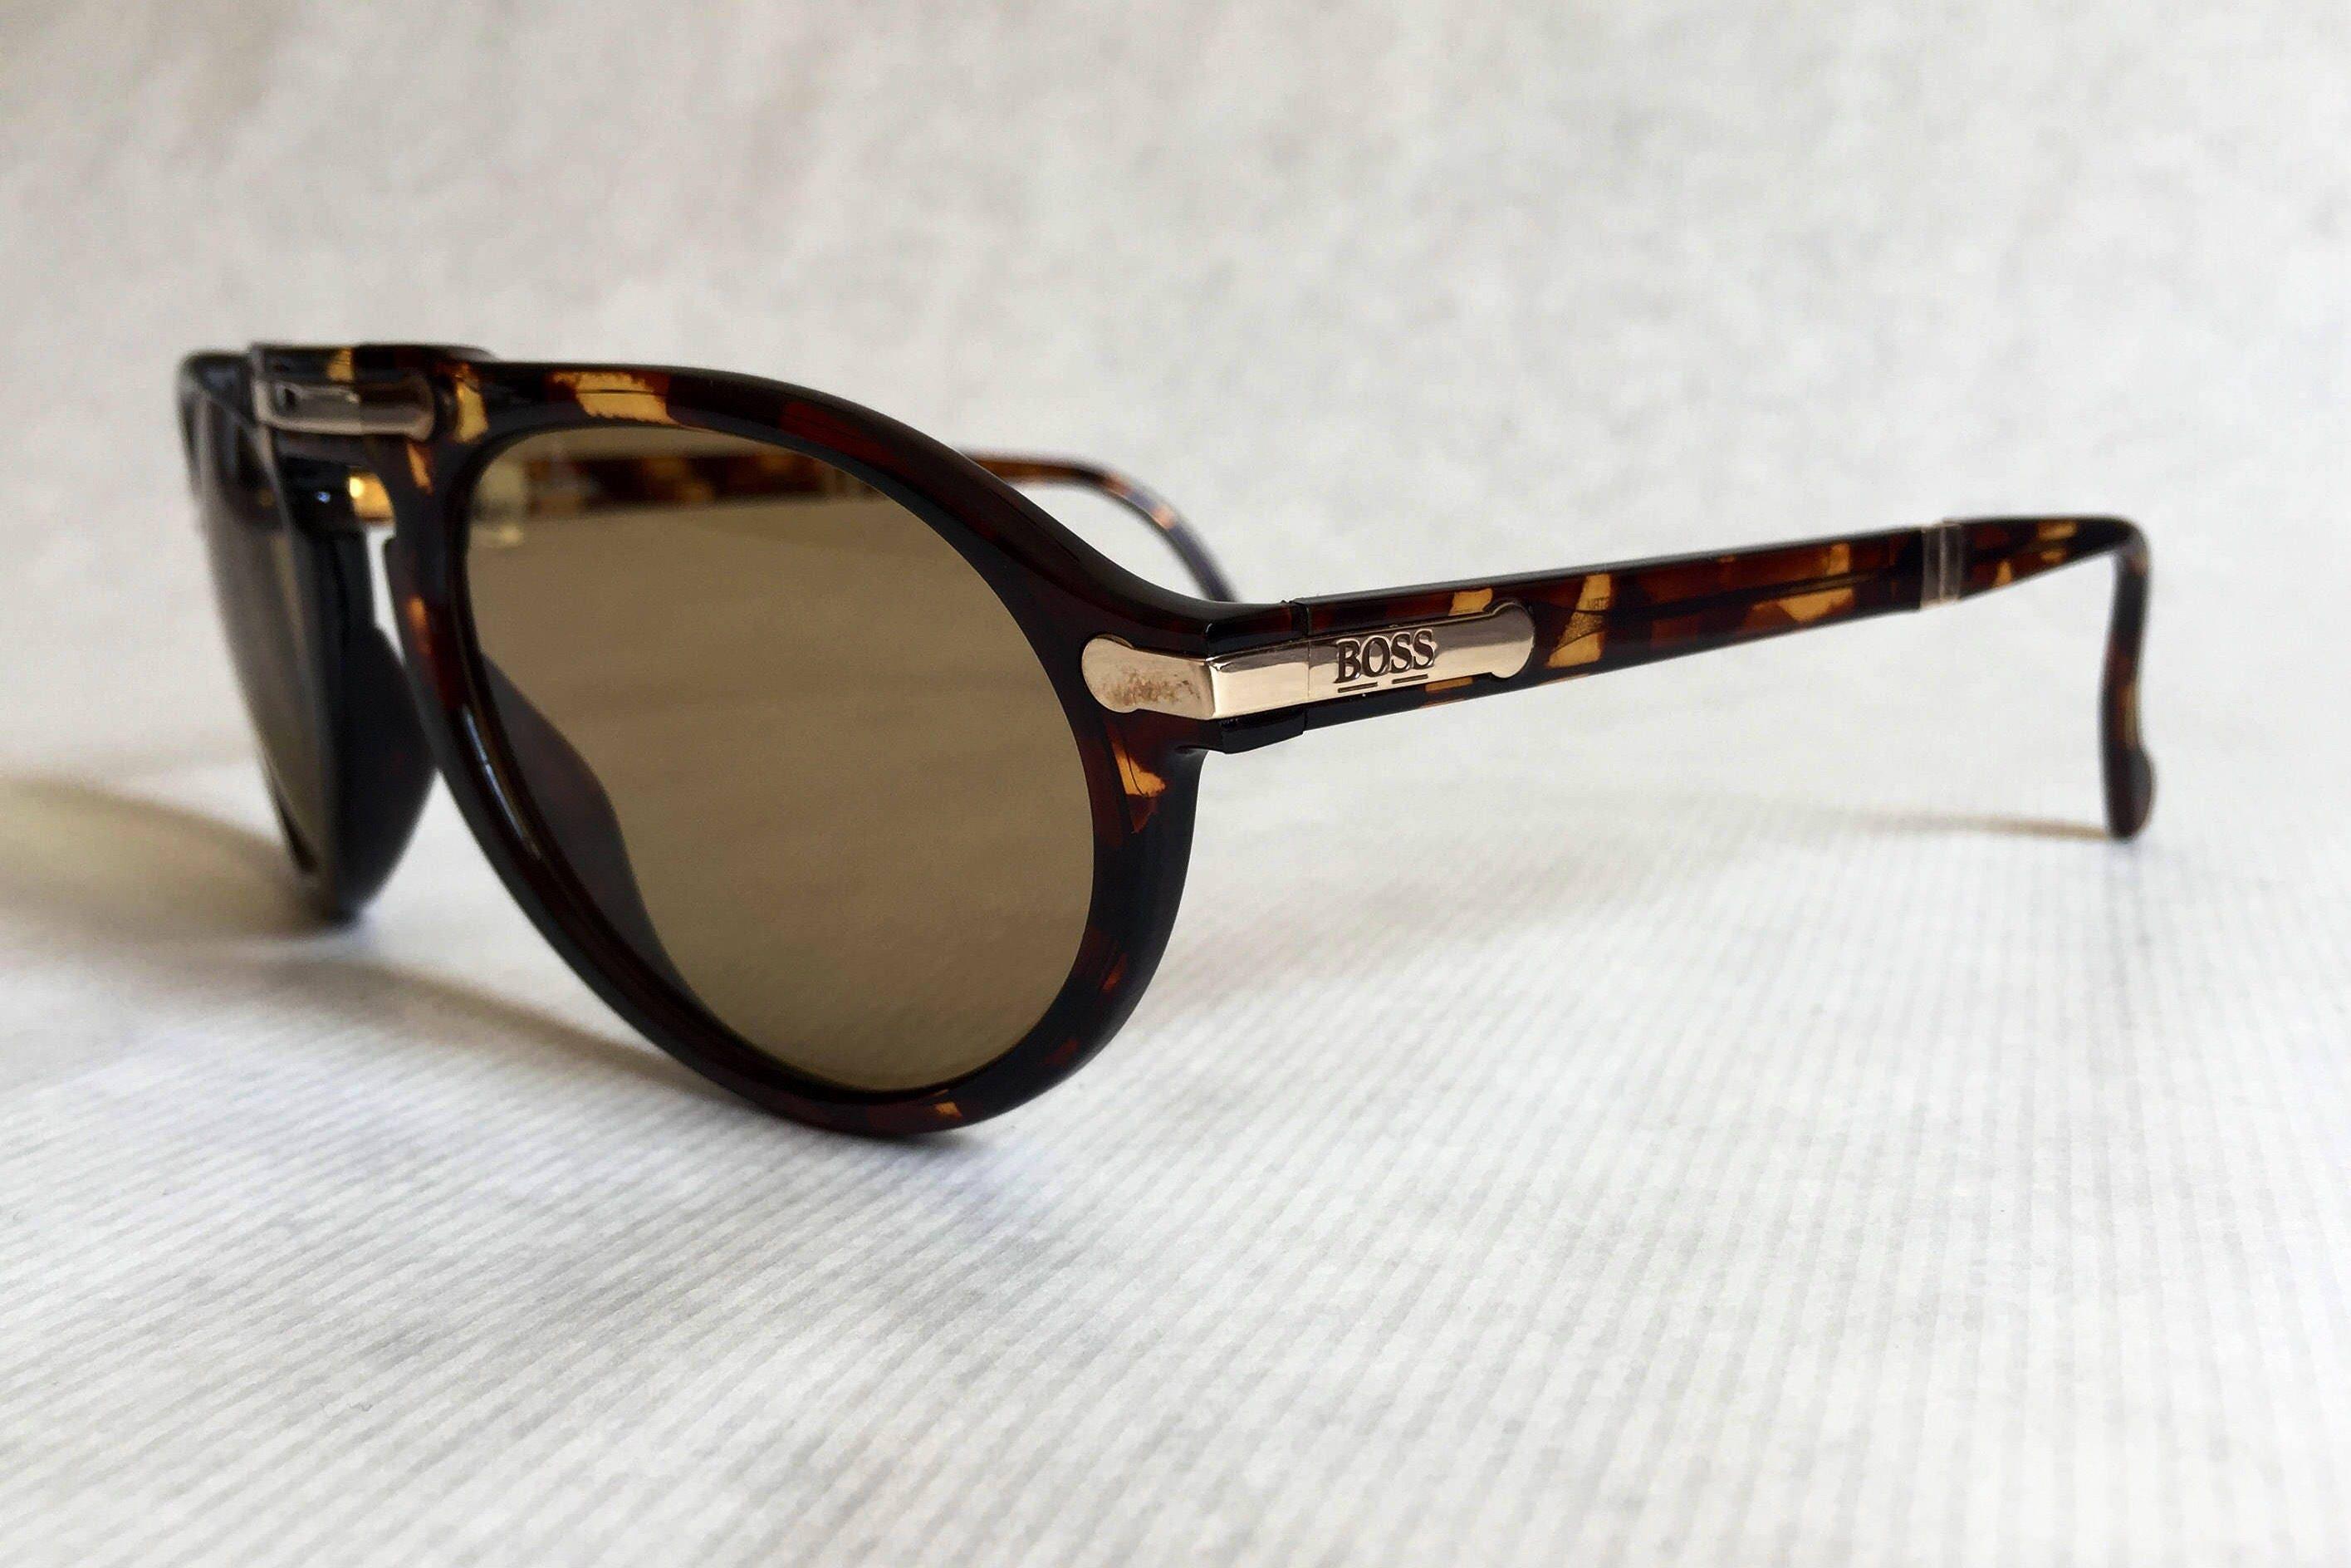 d74c6956b3a Hugo Boss by Carrera 5153 Folding Vintage Sunglasses - New Unworn Deadstock.  gallery photo gallery photo gallery photo gallery photo gallery photo